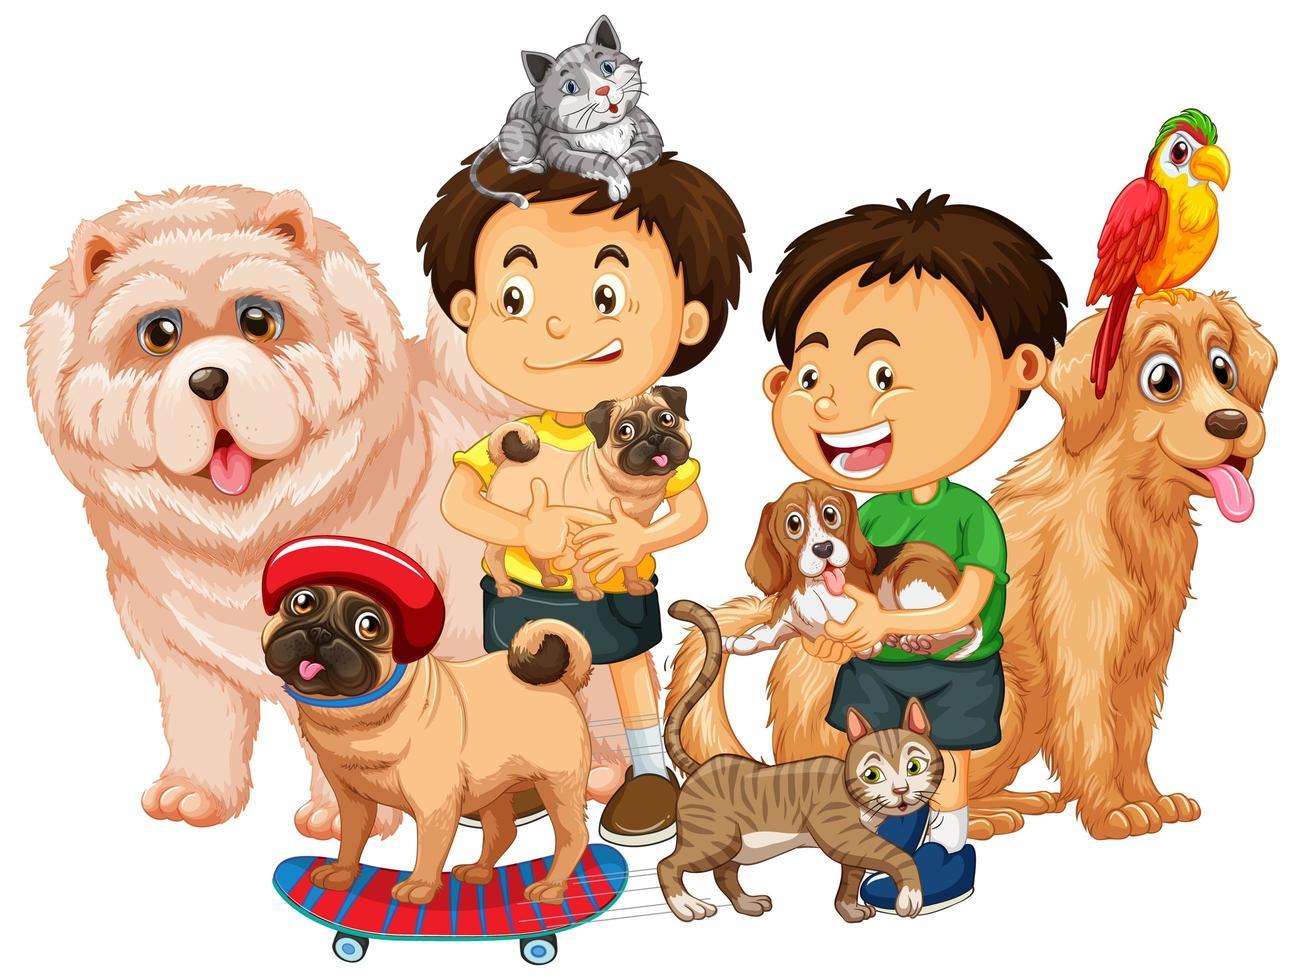 grupp husdjur med ägaren på vit bakgrund vektor